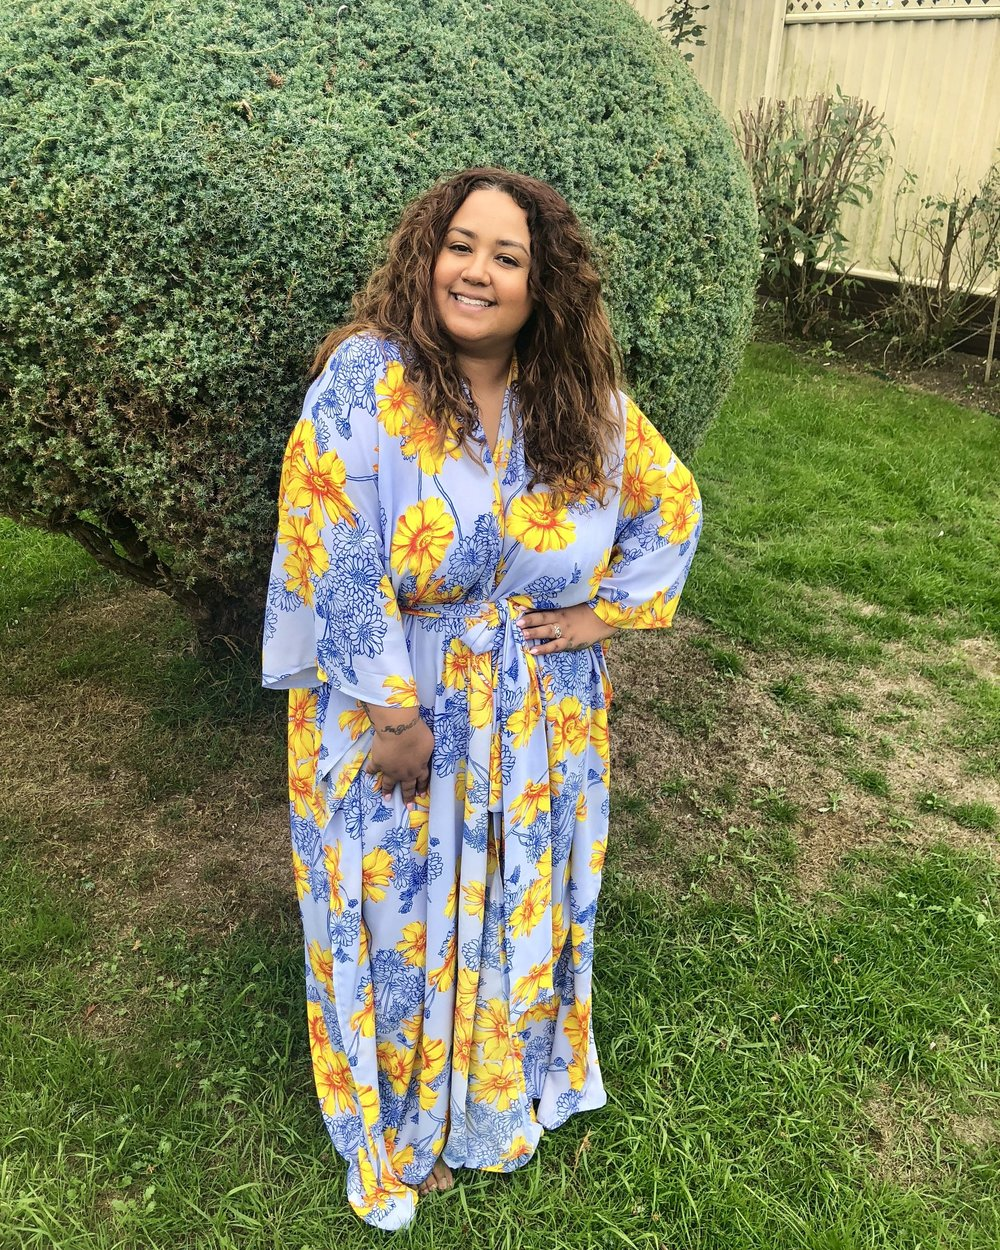 body positivity, black girl magic, plus size fashion., stacey Leigh, Motherhood reconstructed, Candice Brathwaite,